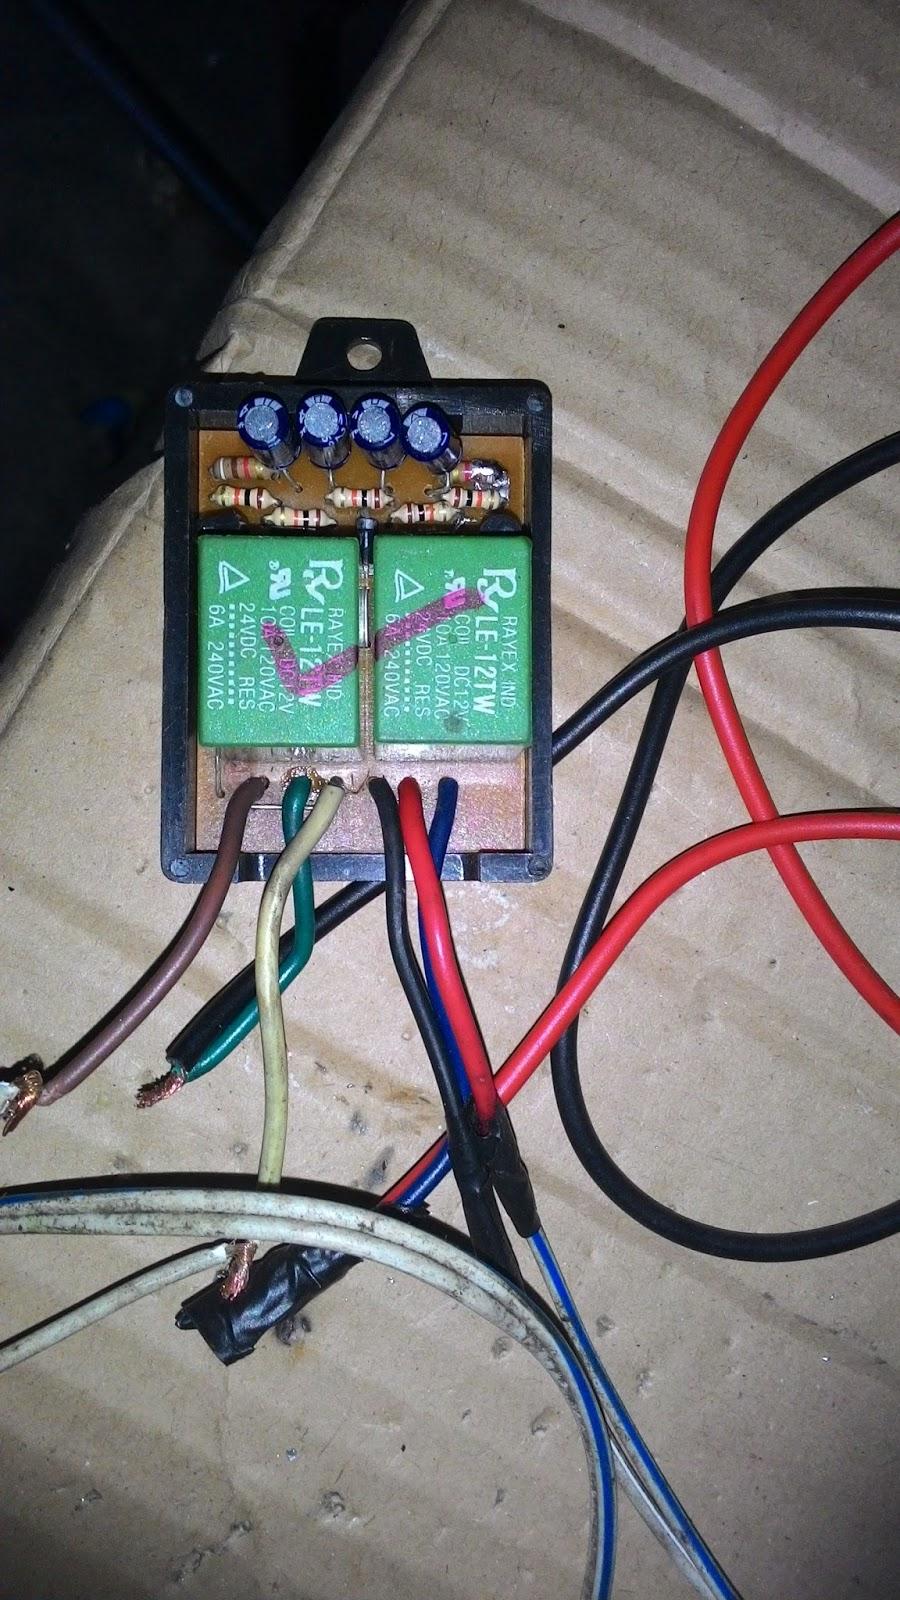 B858 Kancil Central Lock Wiring Diagram   Wiring Resources on volvo v70 battery, volvo v70 cooling, volvo t5 engine diagram, volvo v70 thermostat, volvo v70 oil pump, volvo v70 vacuum diagram, volvo v70 firing order, volvo v70 repair, volvo v70 distributor, volvo v70 power, volvo v70 timing marks, volvo amazon wiring diagram, volvo v70 fuse box diagram, volvo v70 tailgate wiring harness, volvo v70 schematics, volvo v70 rear suspension, volvo ignition wiring diagram, volvo v70 starter, volvo s70 wiring-diagram, volvo 240 wiring diagram,